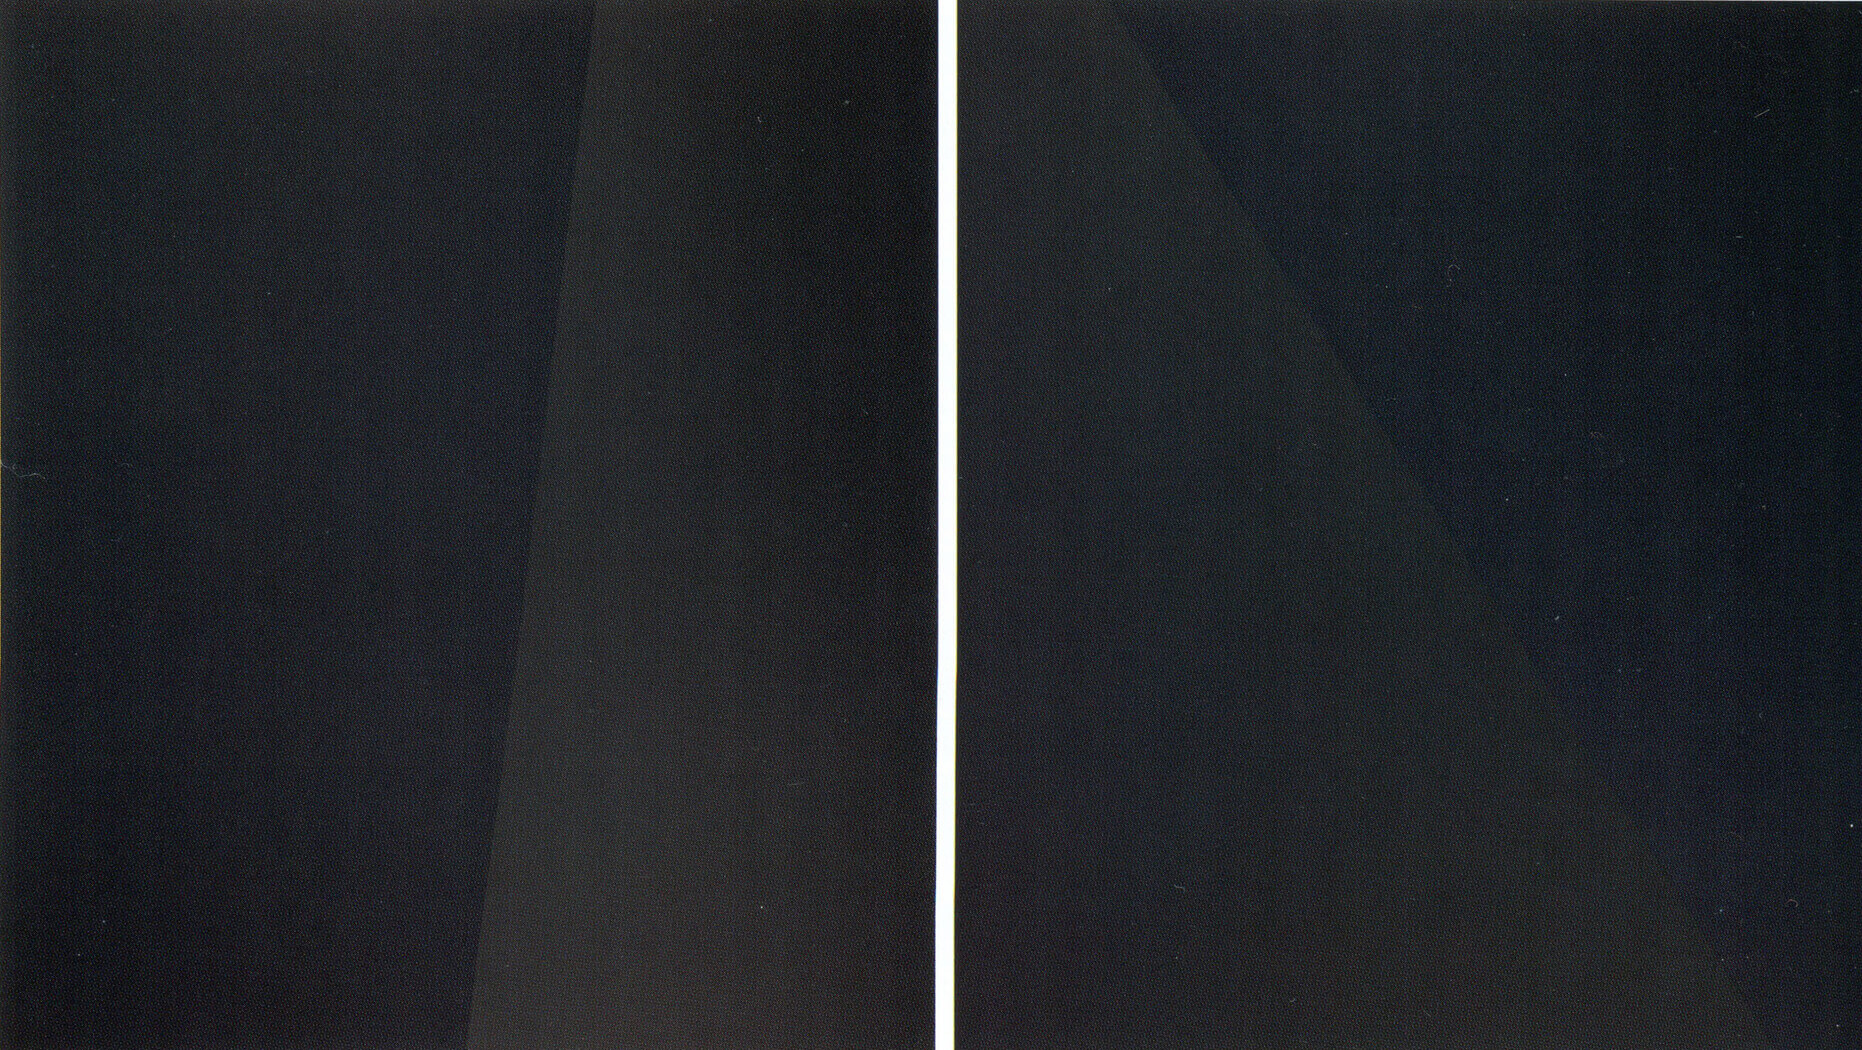 Yves Gaucher,Jericho 1, 1978